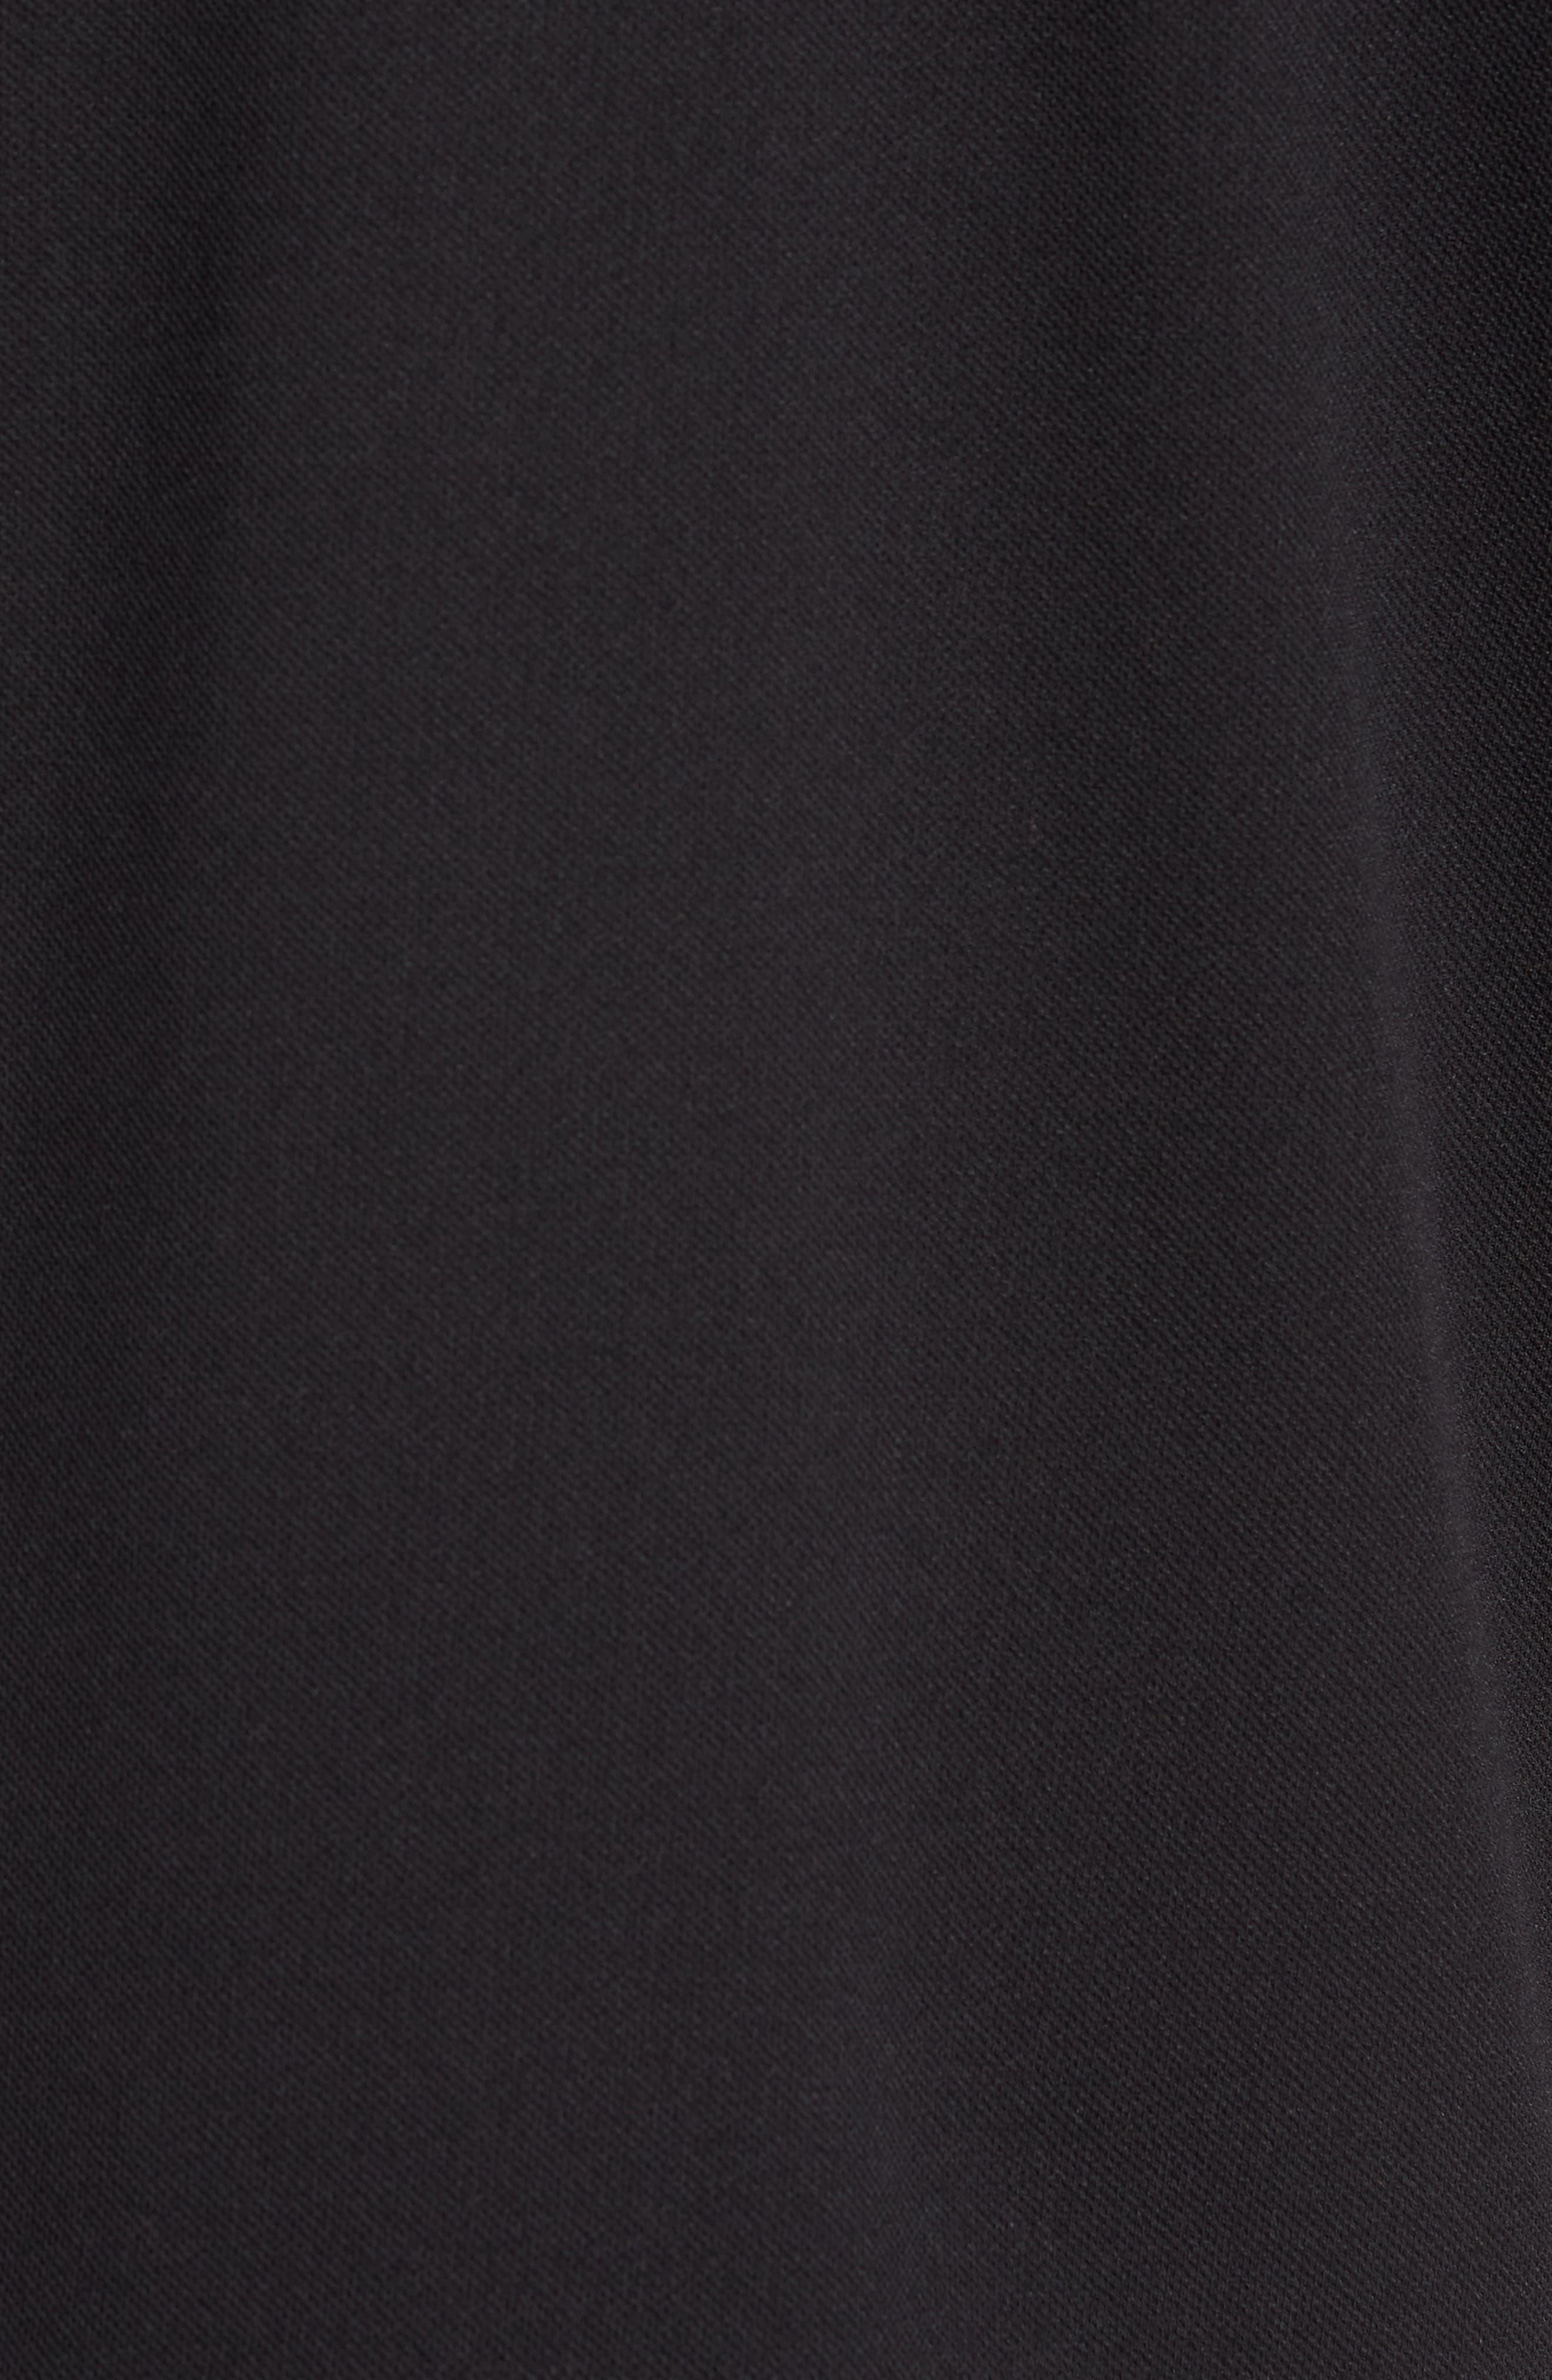 Performance Quarter Zip Pullover,                             Alternate thumbnail 5, color,                             Black/ Black